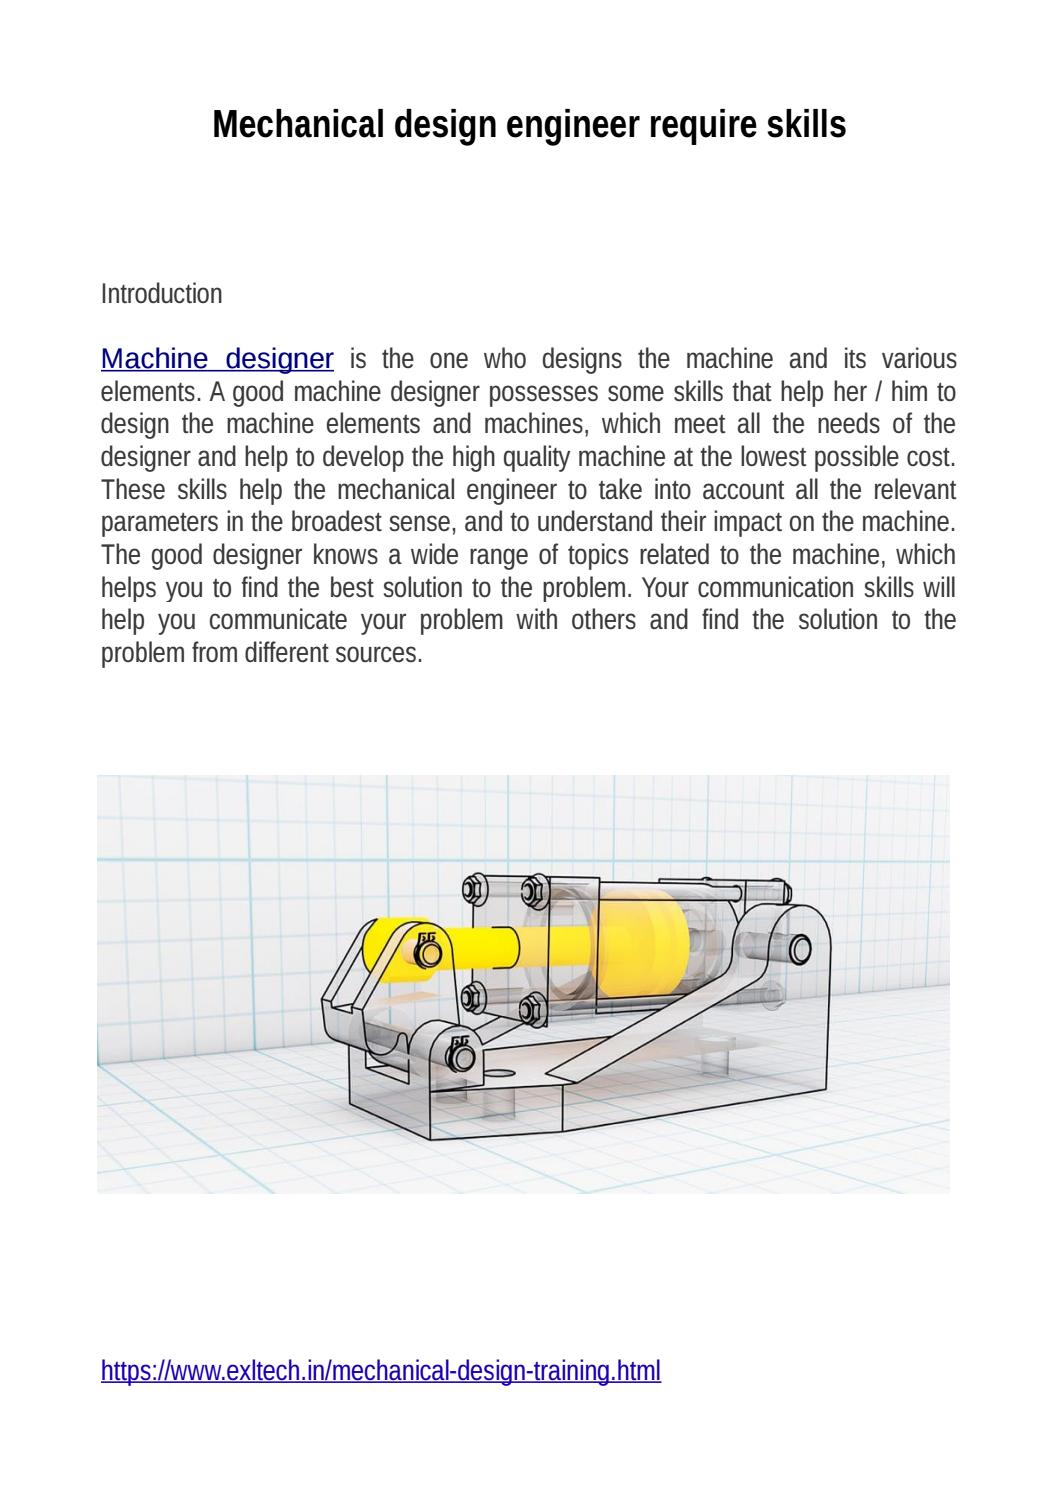 Mechanical Design Engineer Require Skills By Misha Kapoor Issuu